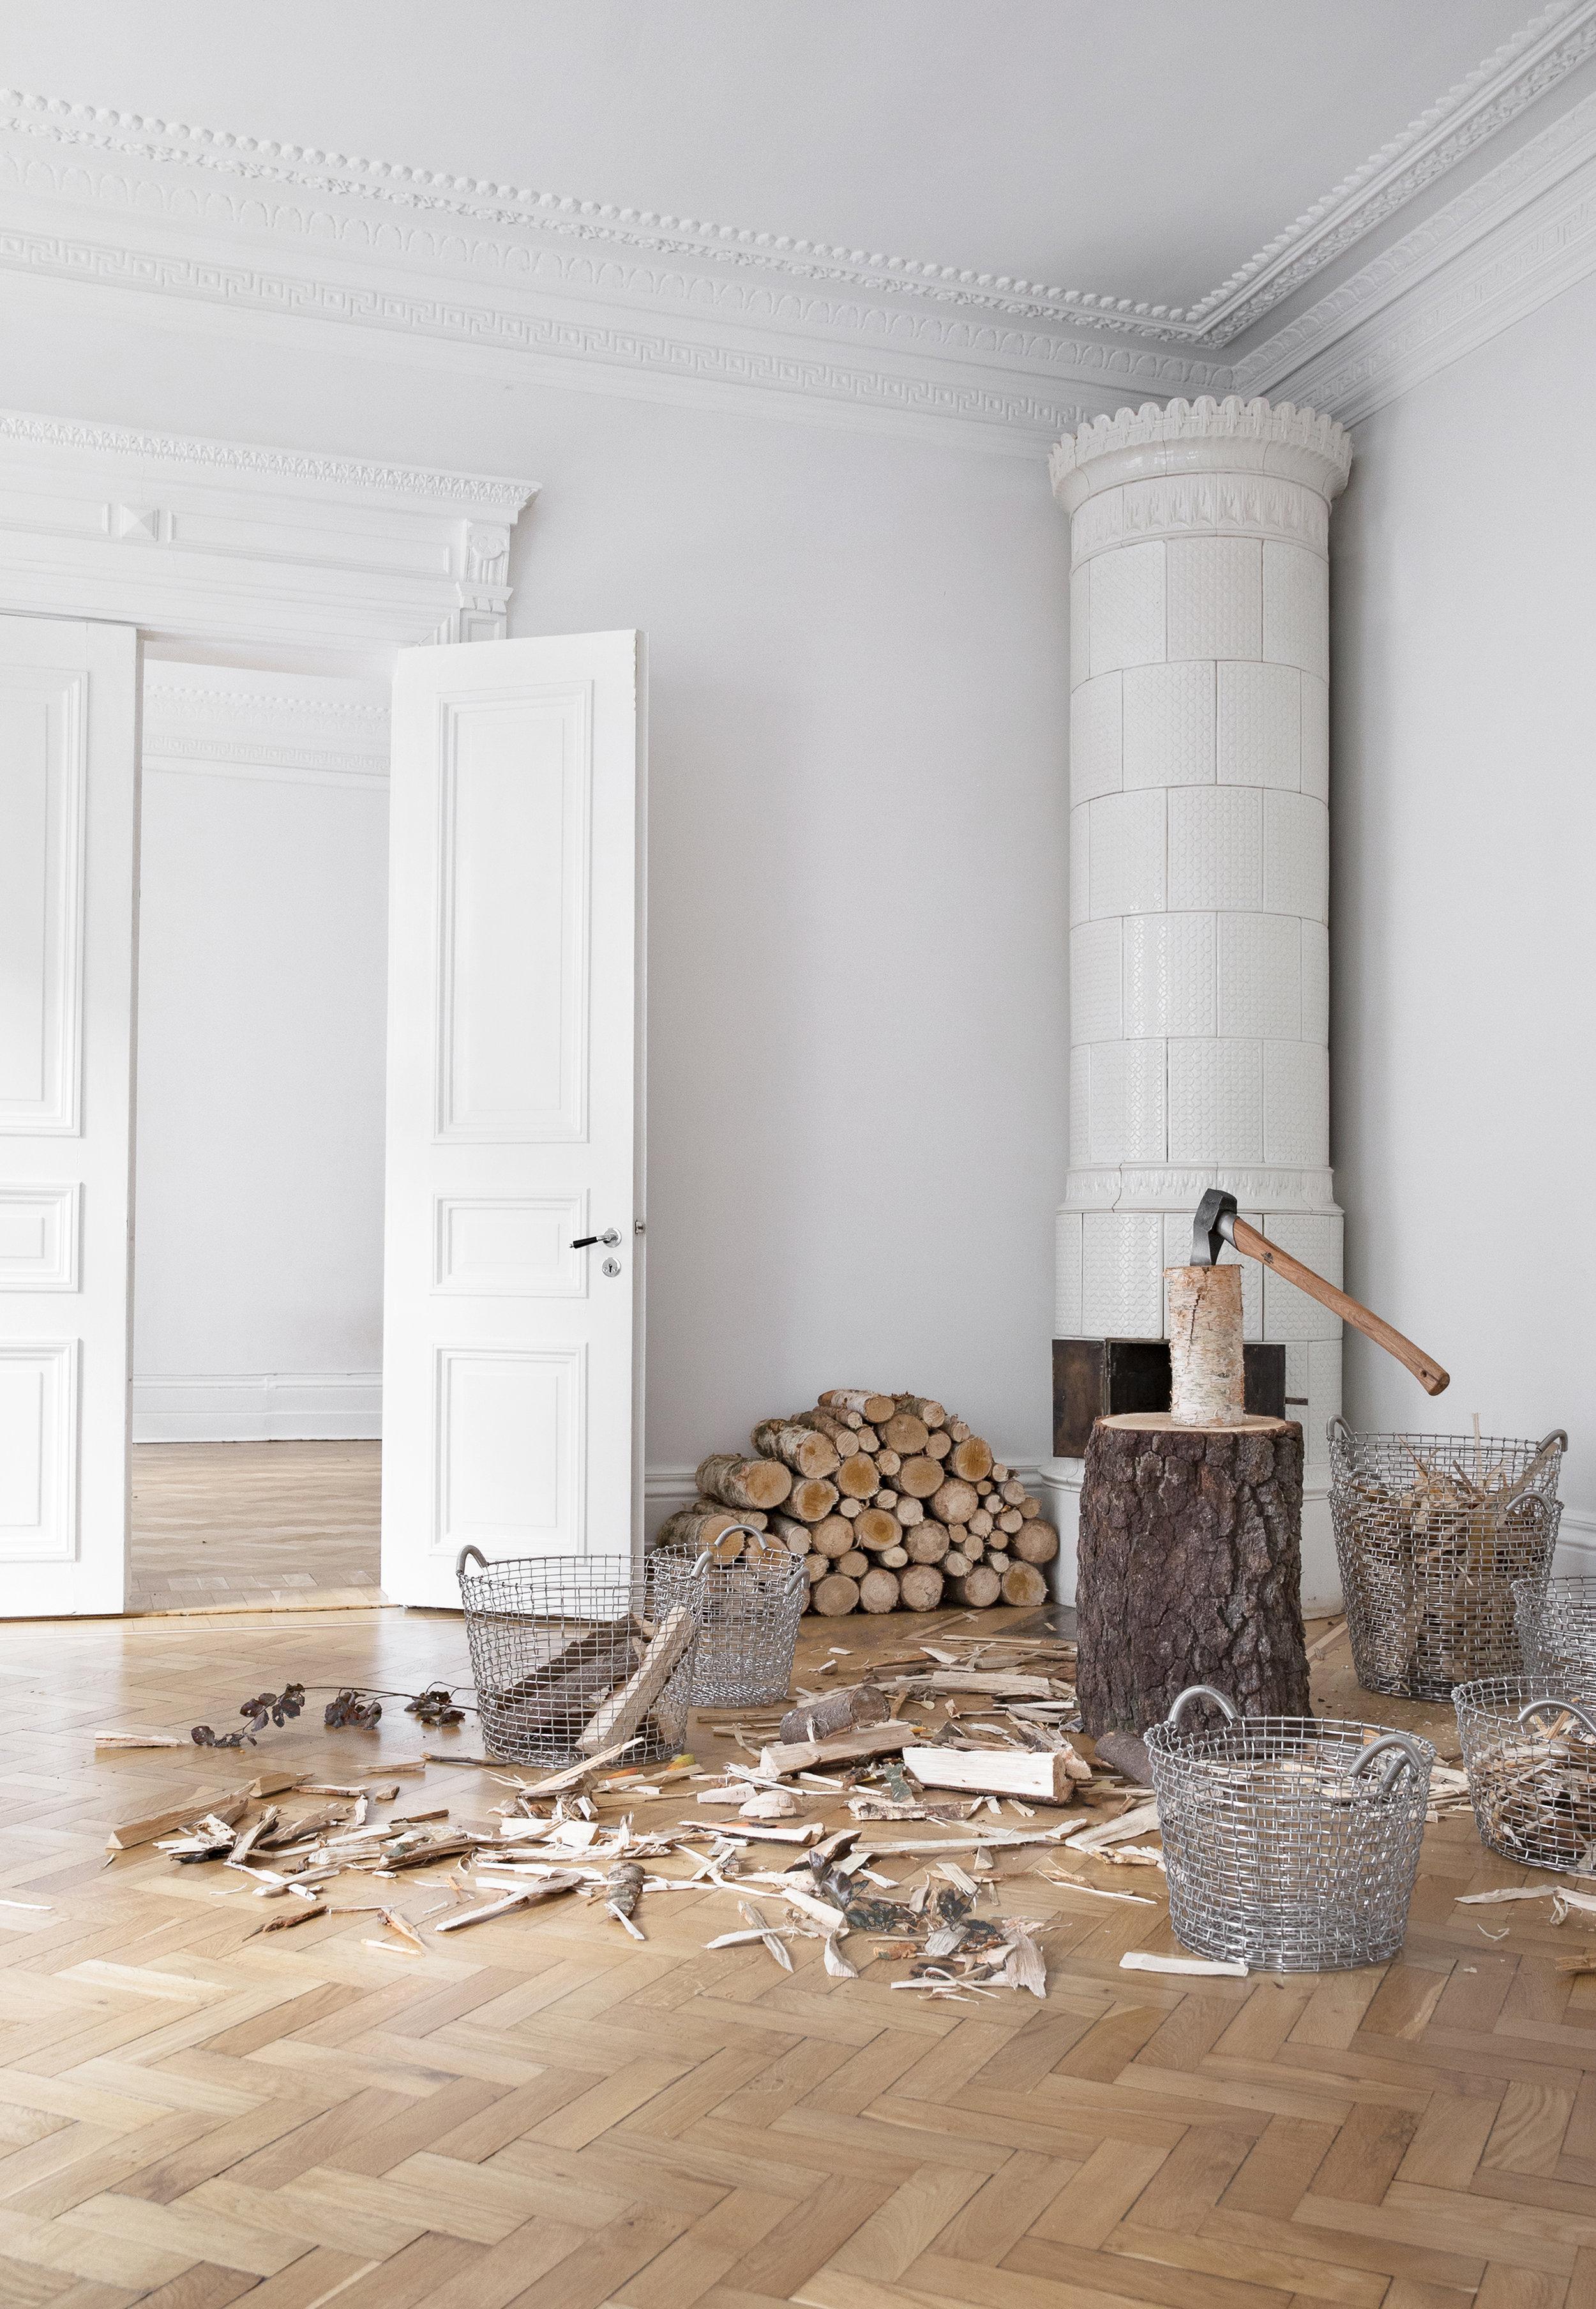 Fireplace and log basket inspiration